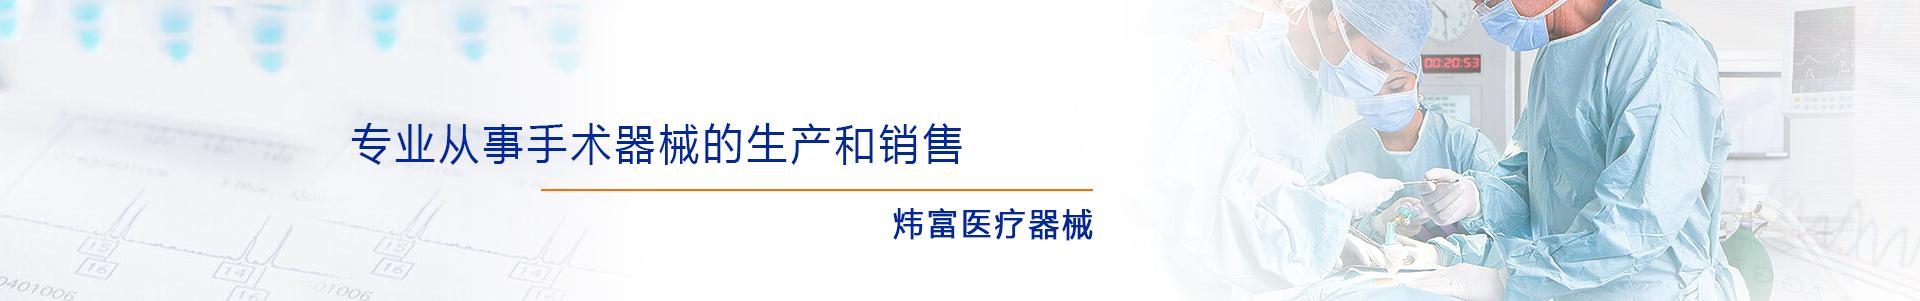 http://www.wavemedical.cn/data/upload/202012/20201228141411_260.jpg